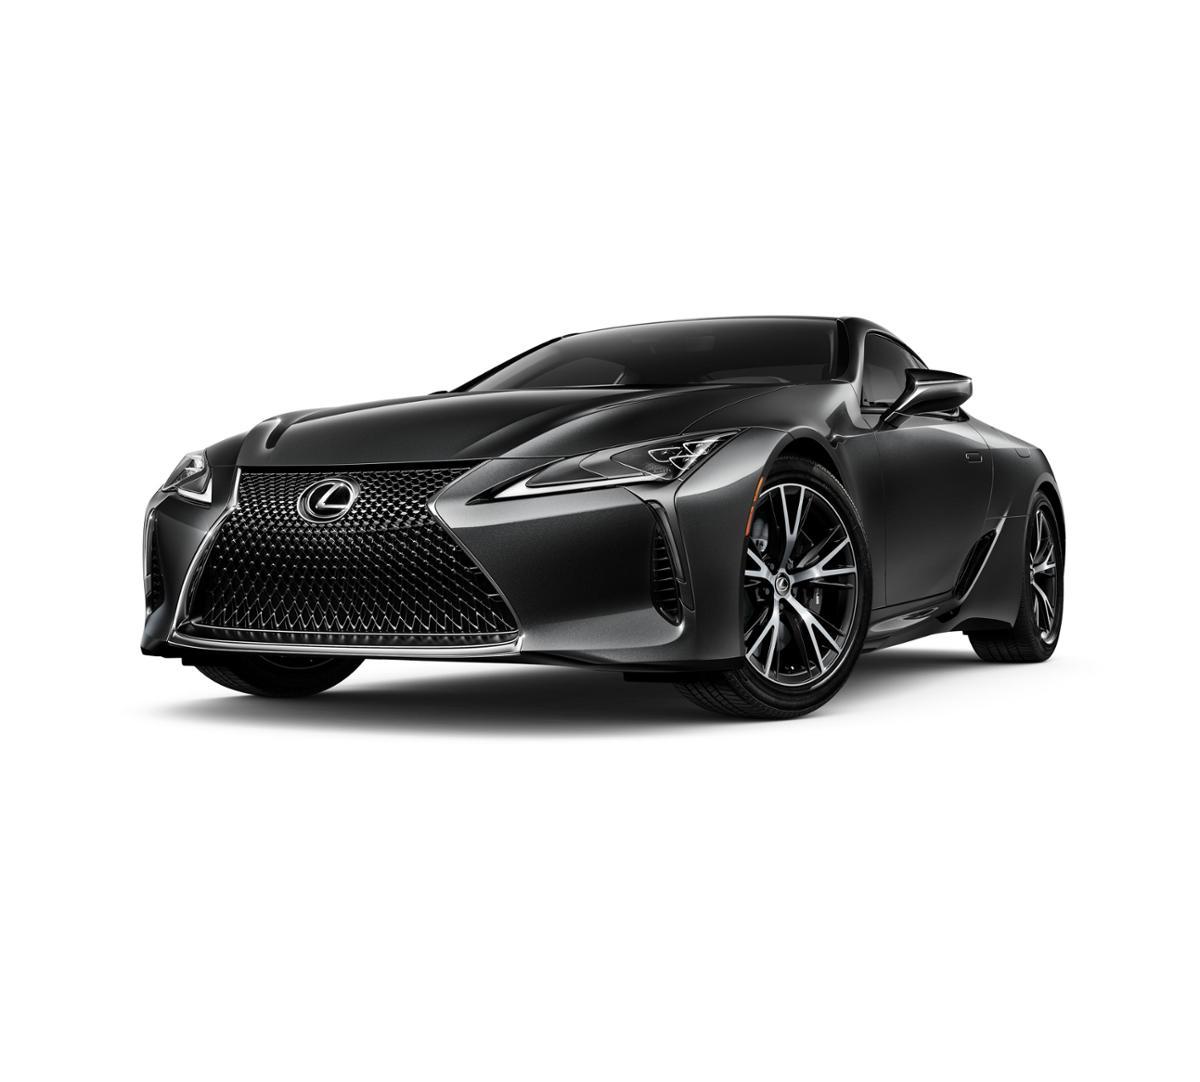 Lexus Service Santa Monica >> New Smoky Granite Mica 2018 Lexus LC 500 F SPORT for Sale Santa Monica, CA | Lexus Santa Monica ...